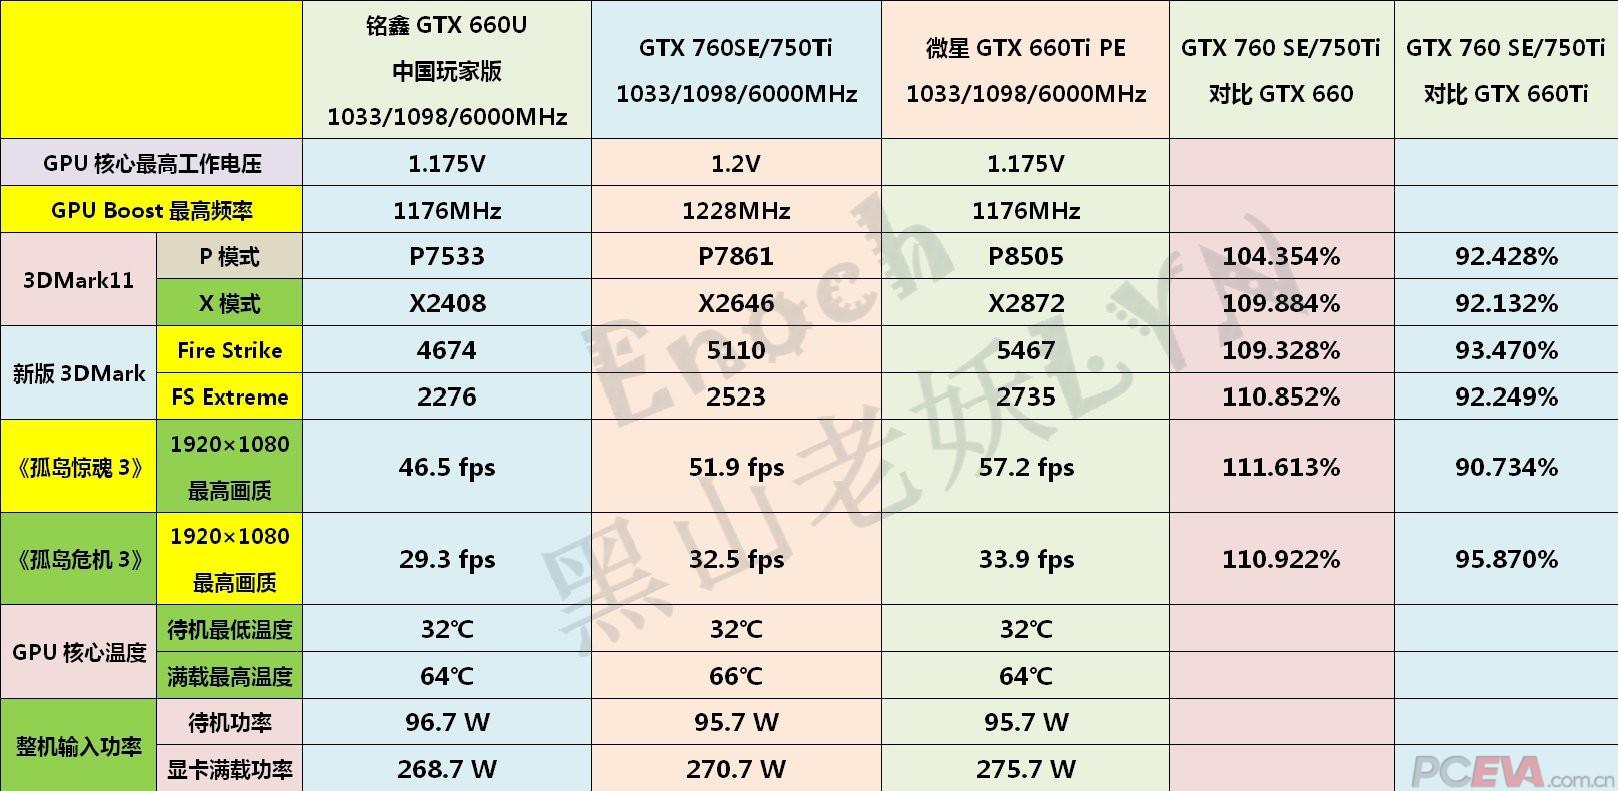 NVIDIA GeForce GTX 750 TI performance